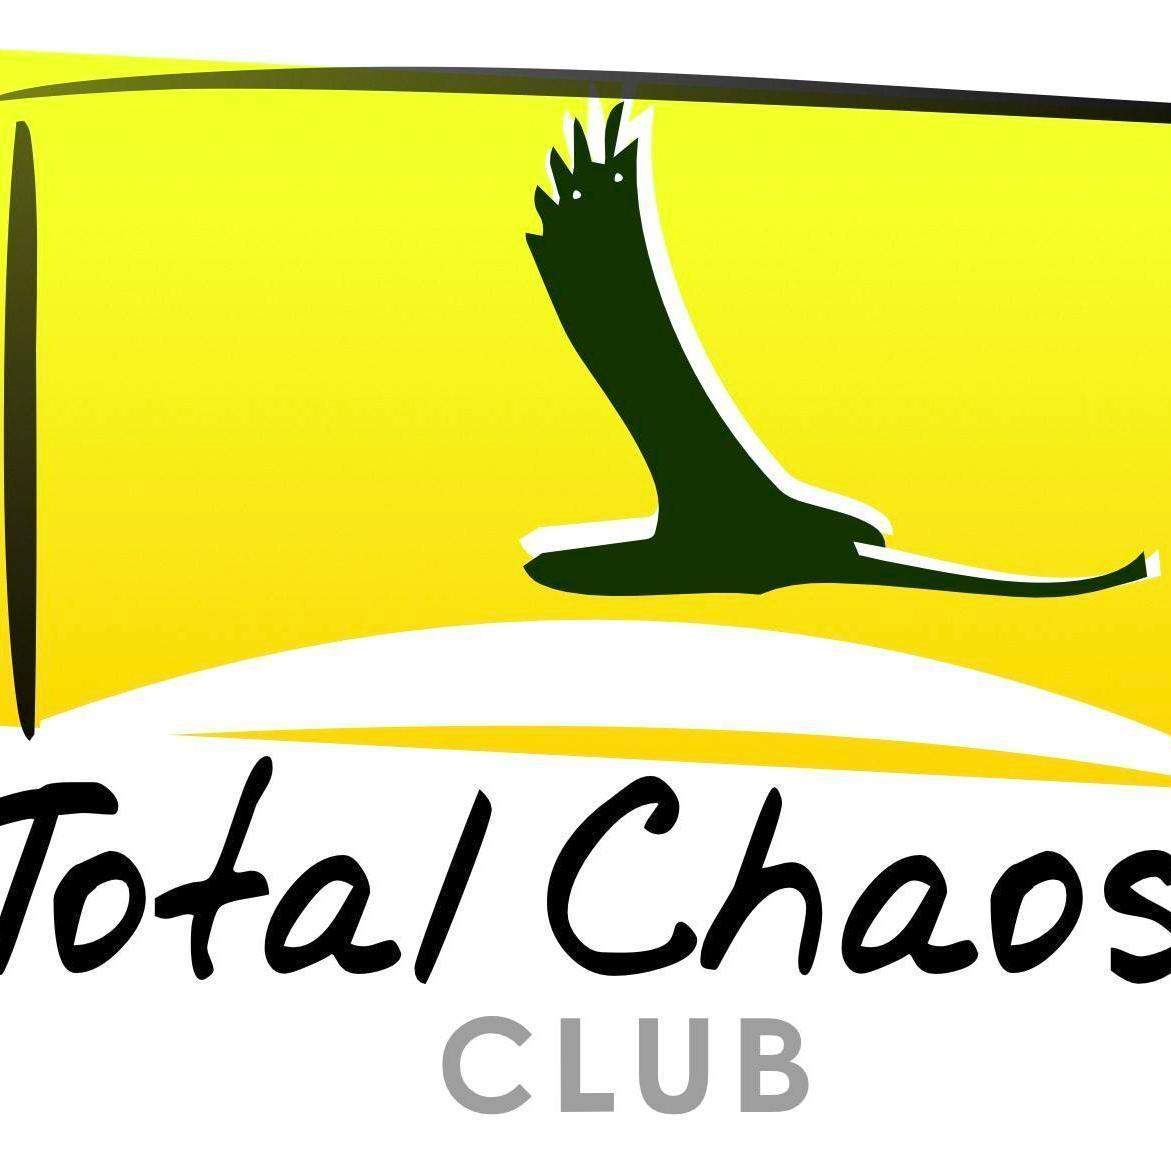 TotalChaosClub